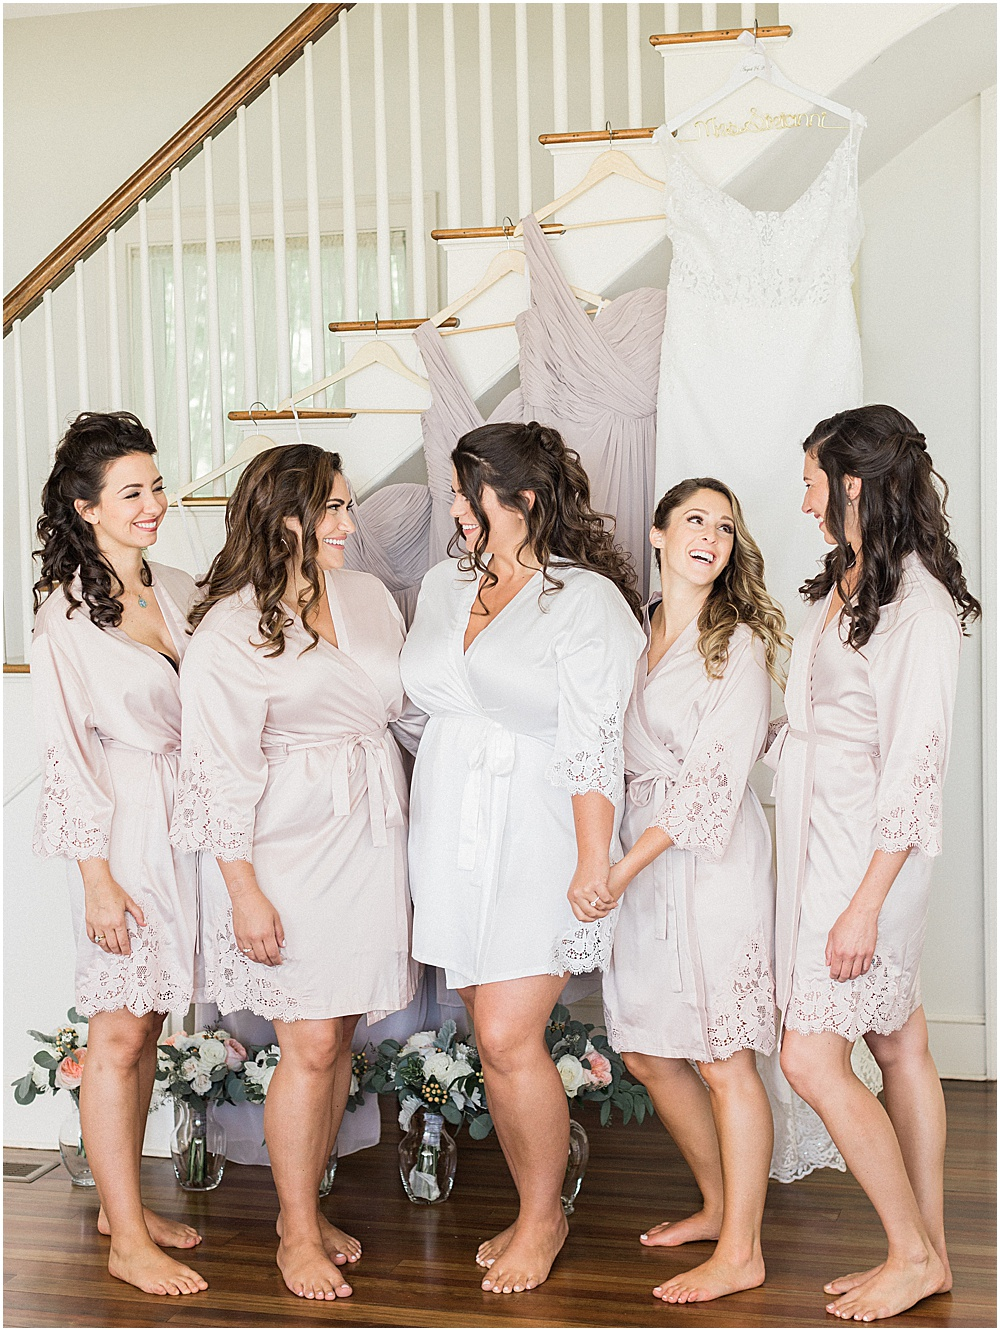 tabor_academy_rebecca_chris_tented_interior_trees_engagement_session_cape_cod_massachusetts_boston_wedding_photographer_meredith_jane_photography_photo_0692.jpg